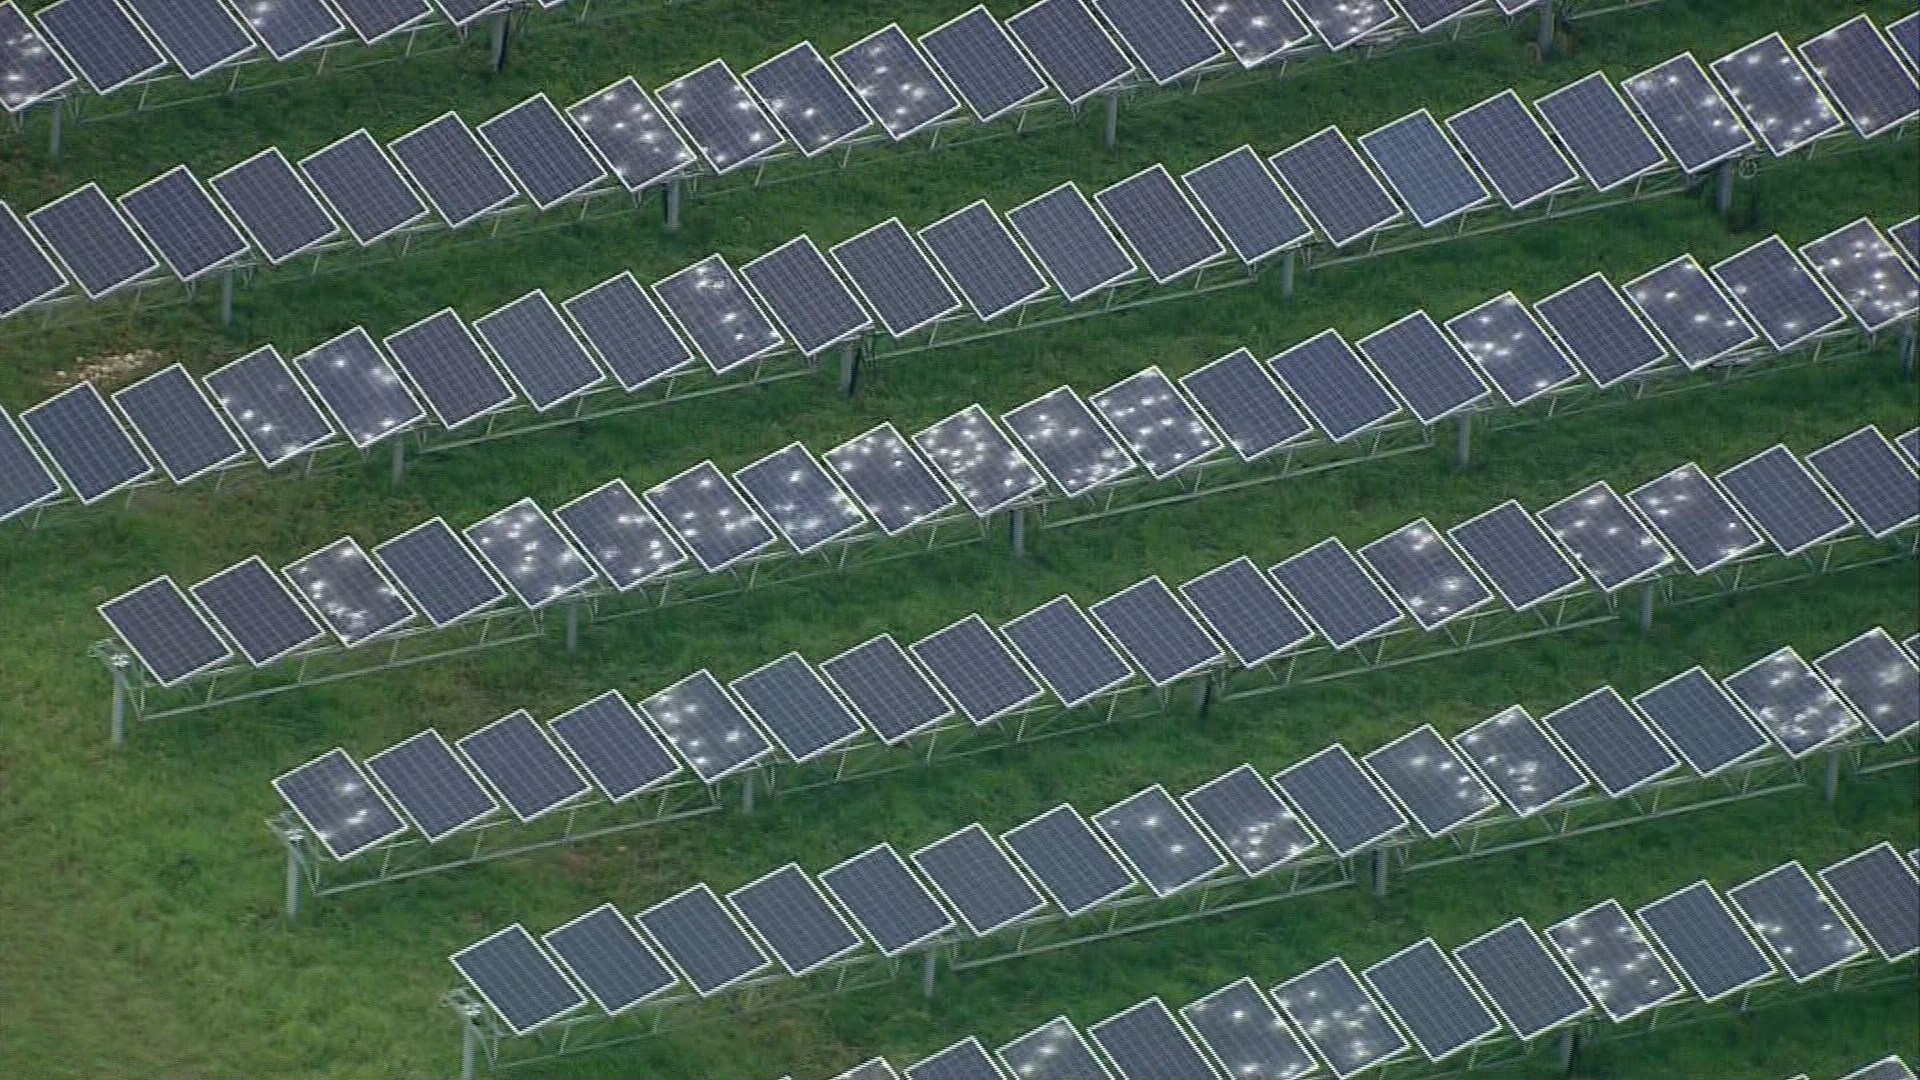 solar storm panels - photo #20